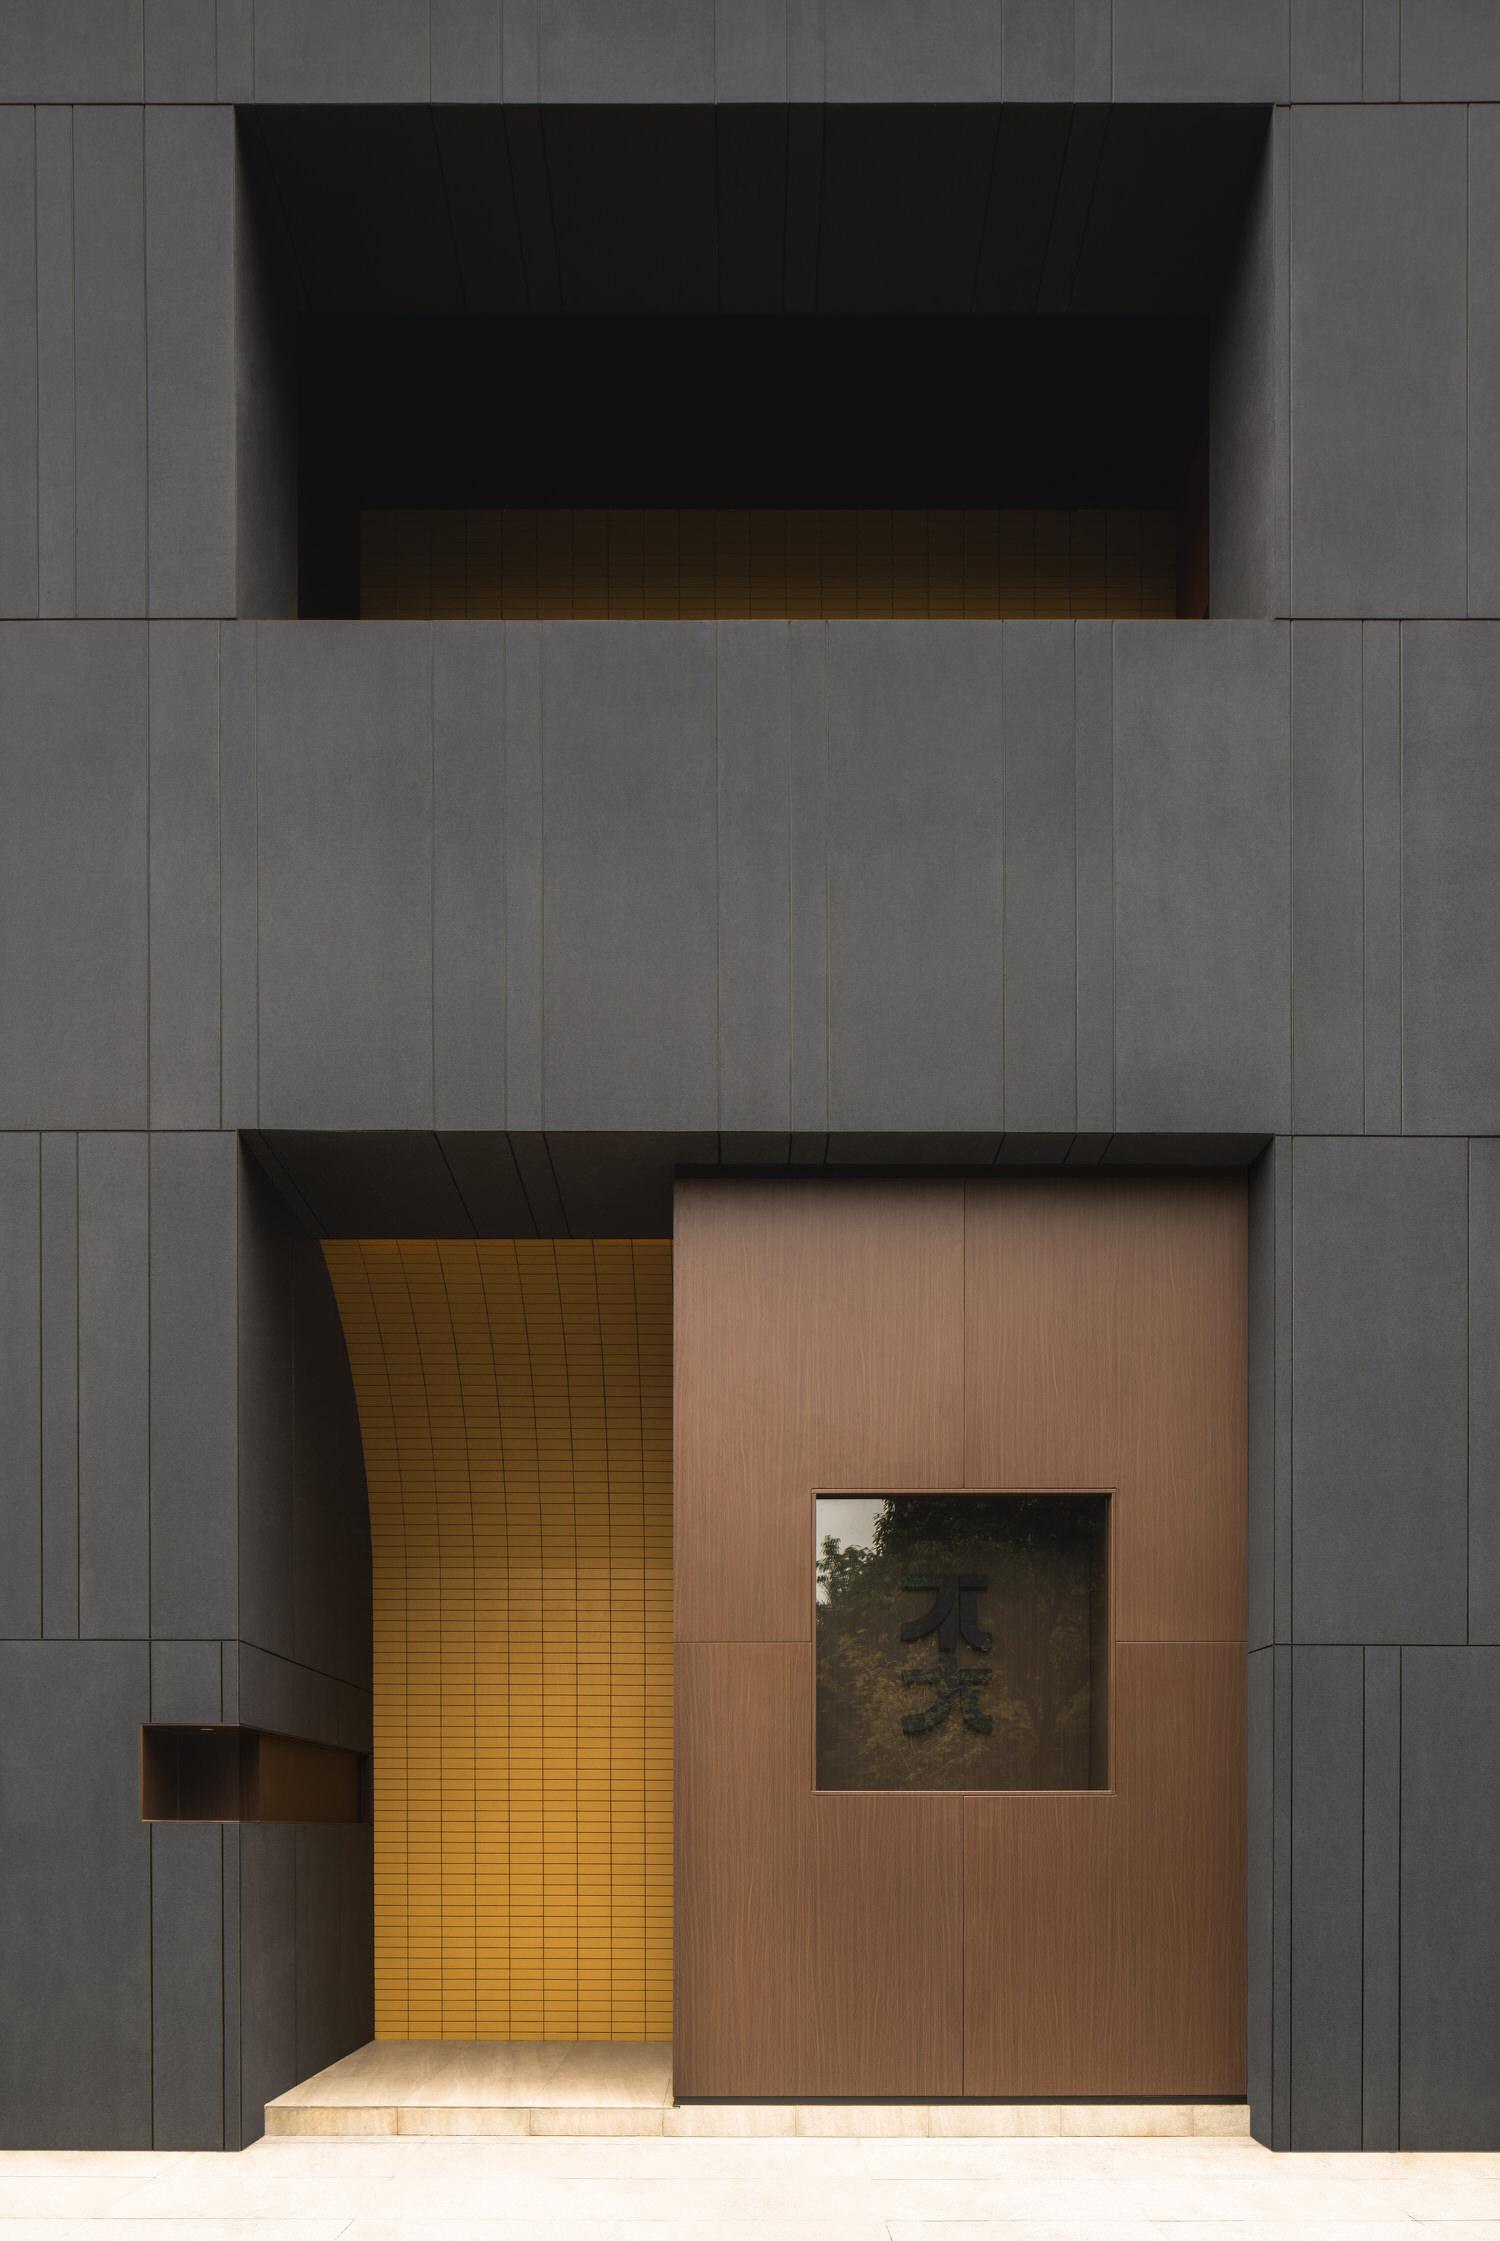 Archetype Design Organization Buda Hotel Chengdu Photo Here Space Yellowtrace 01